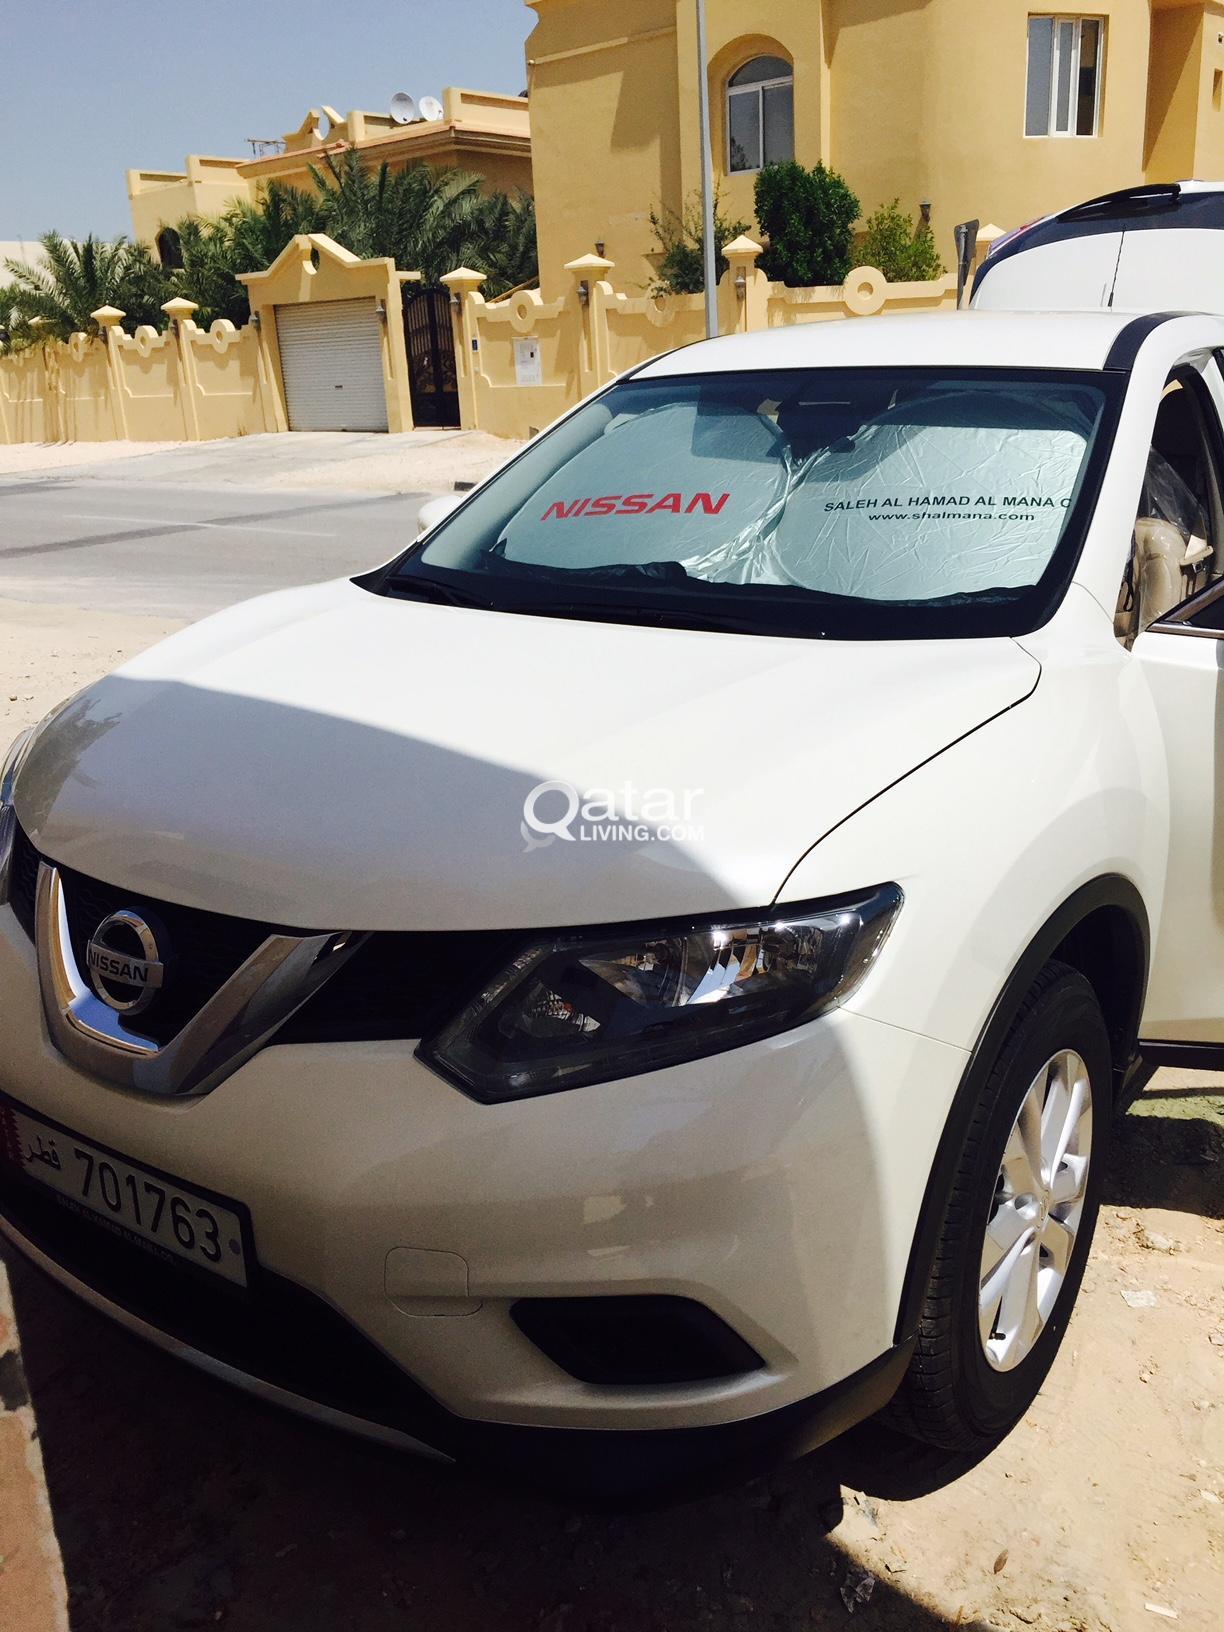 NISSAN - XTRAIL | Qatar Living